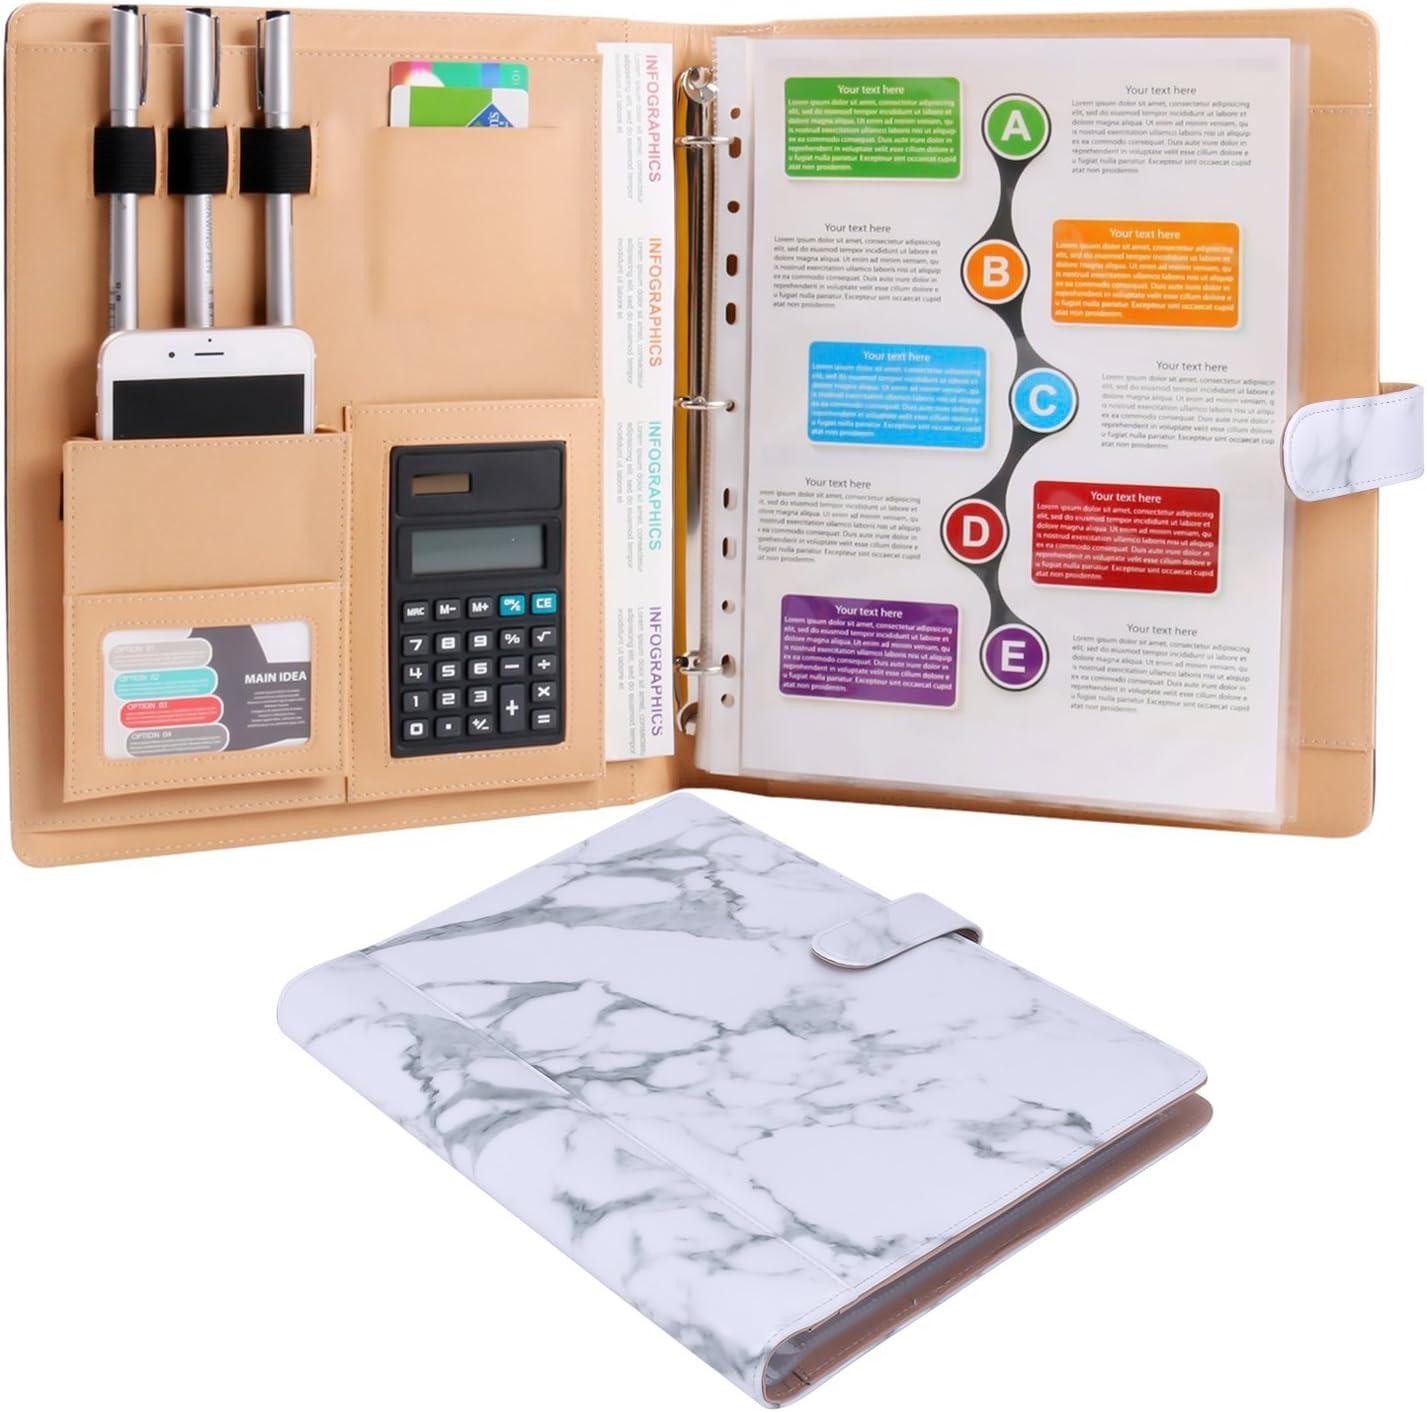 Z PLINRISE Plinrise High Grade Multifunction Letter Size Padfolio/Resume Portfolio Folder-Document Organizer/Business Card Holder with Calculator and 8 File Pockets, White Marbling